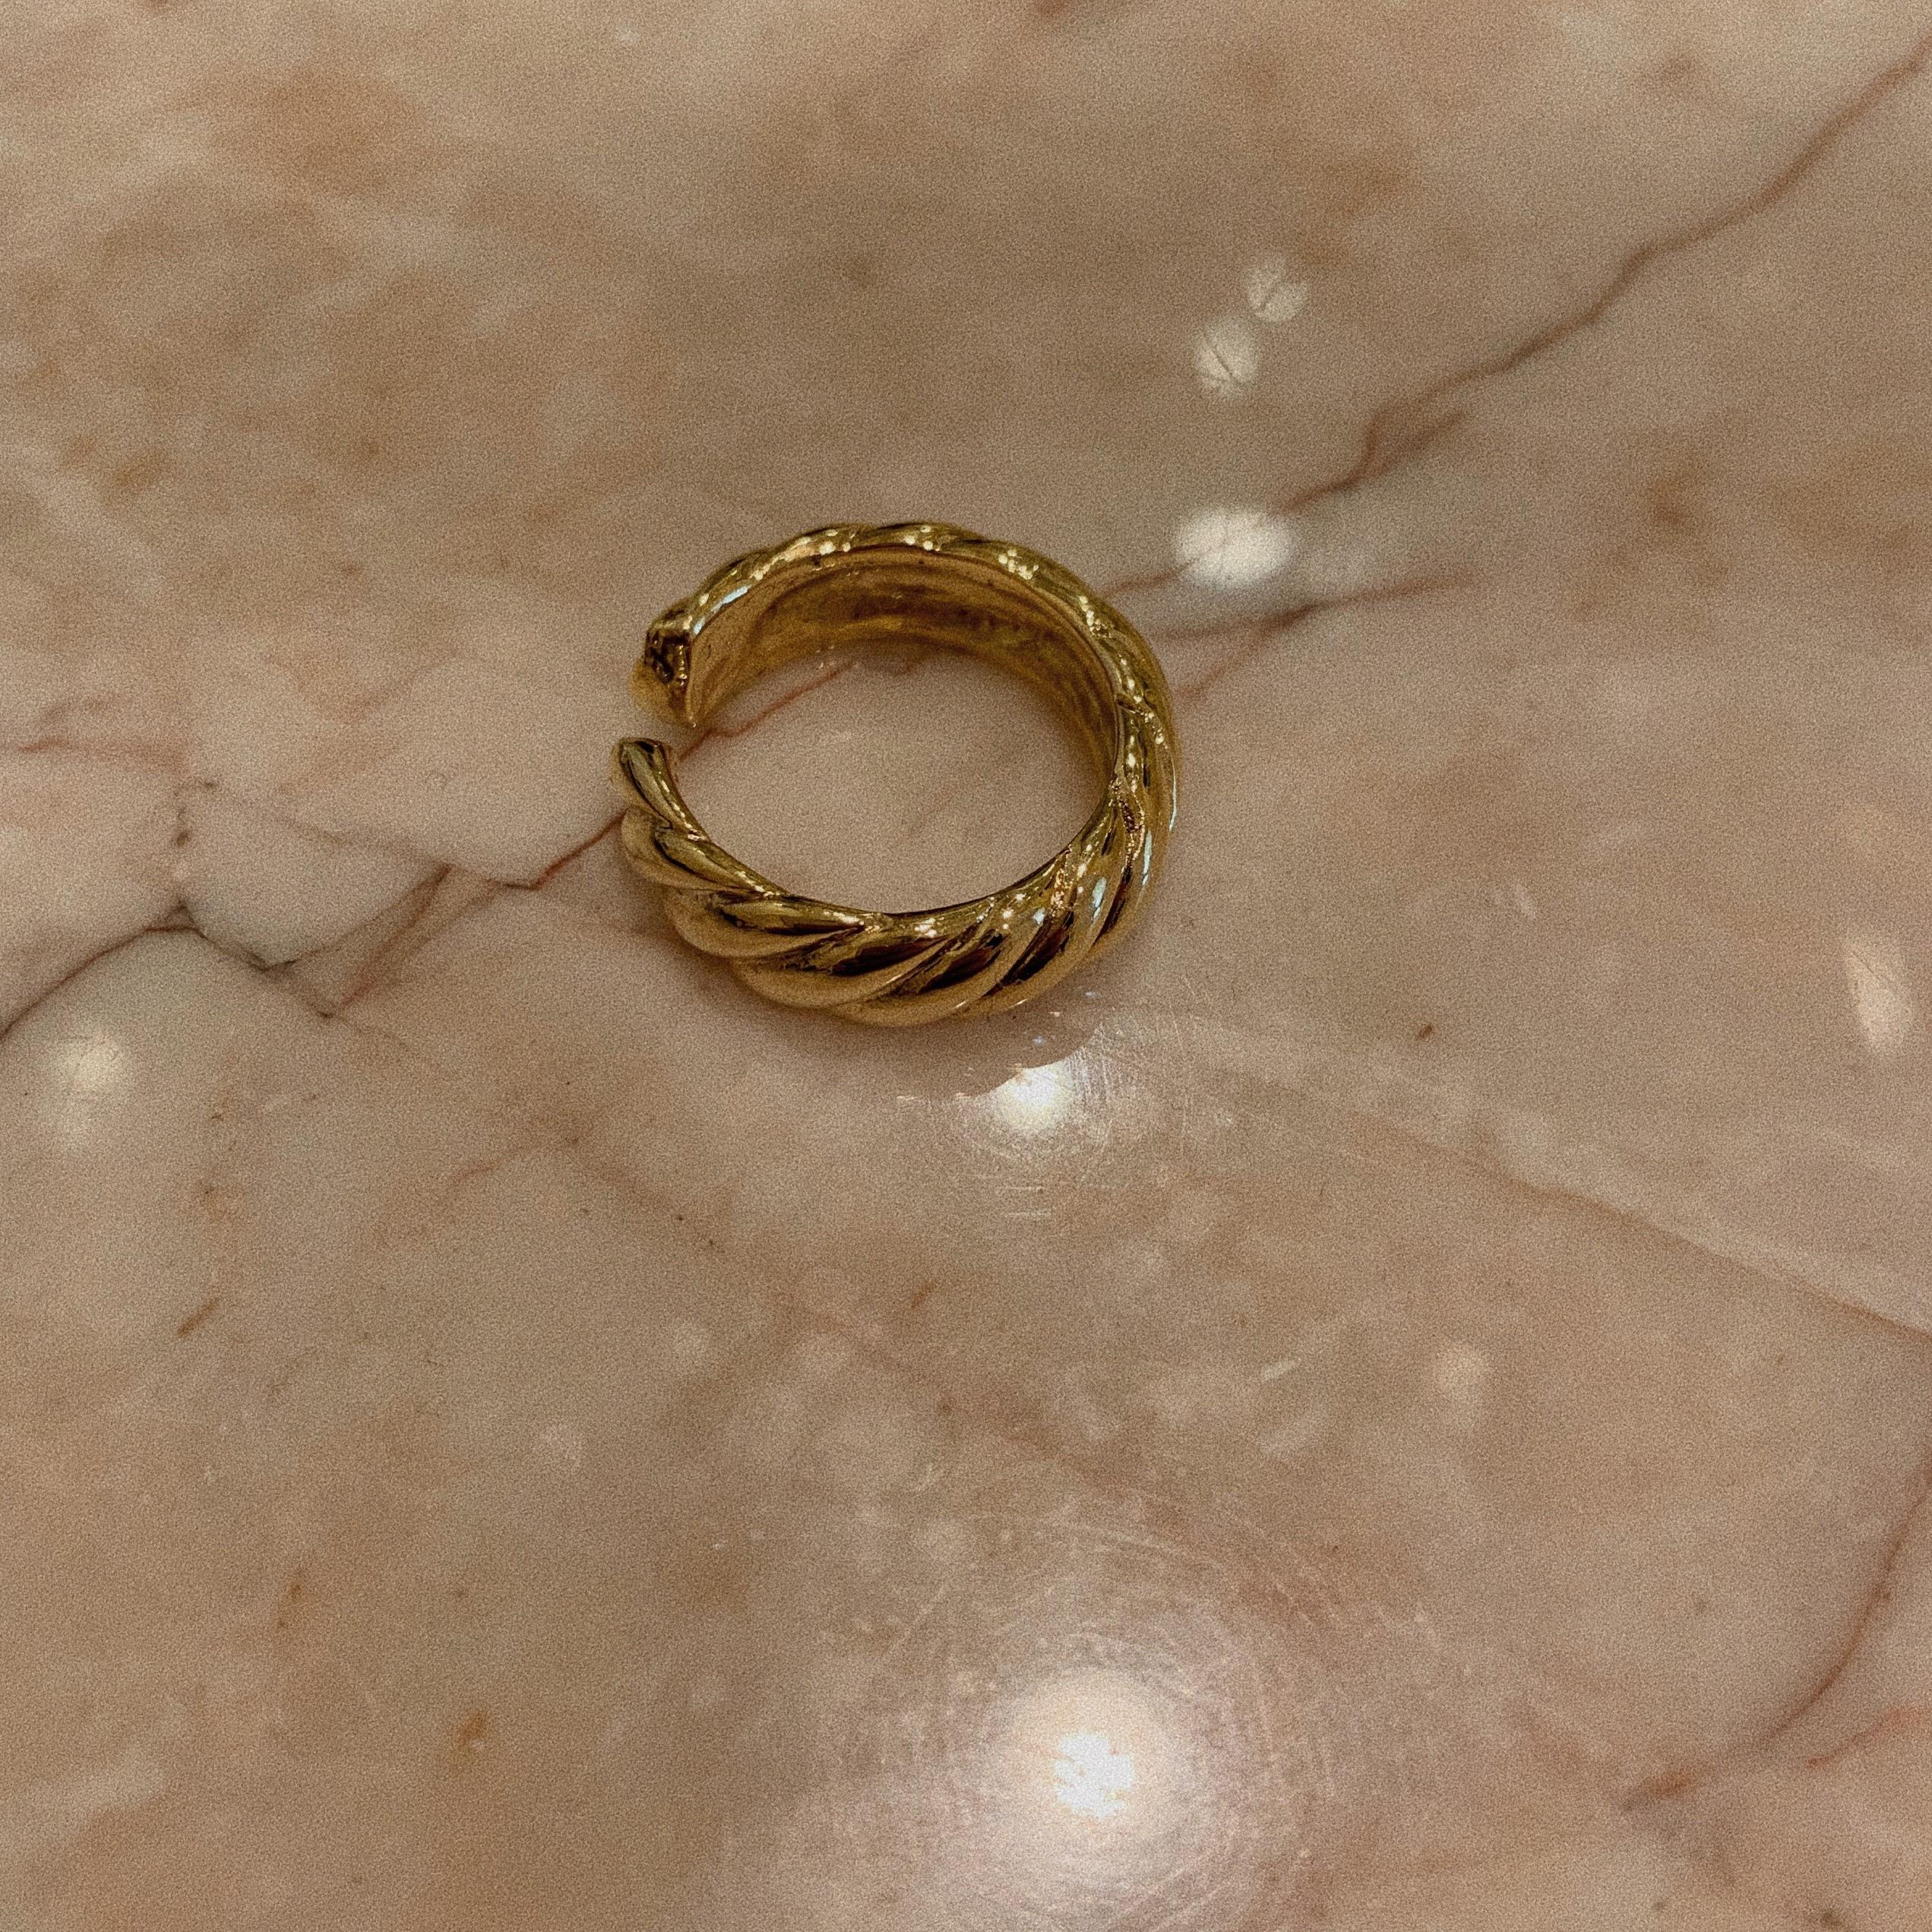 gold ring(twist)